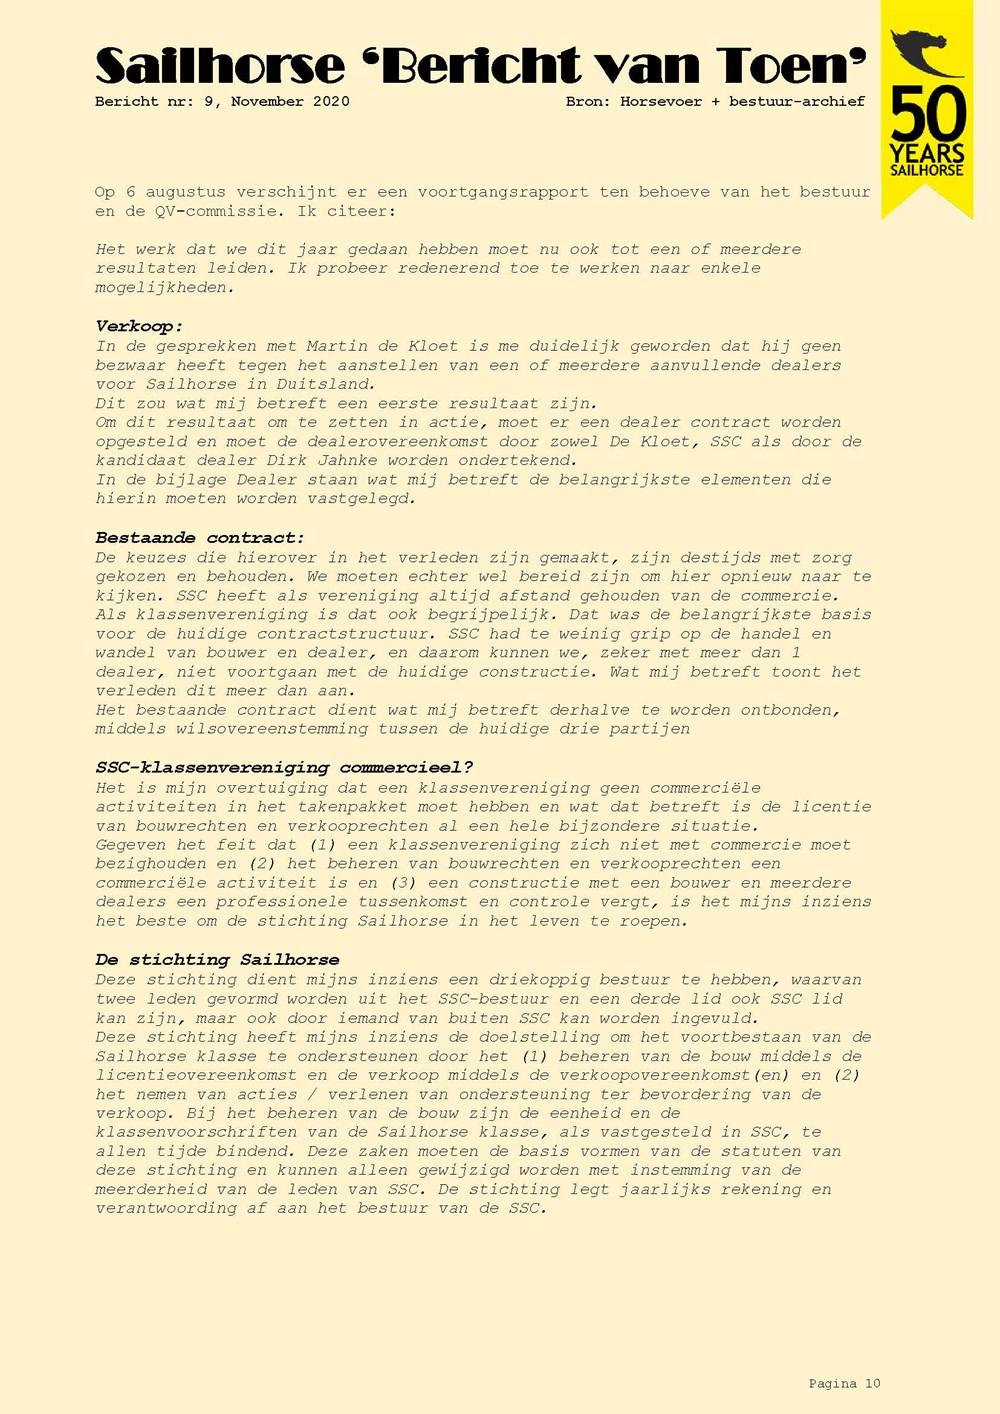 BvT09_Page_10.jpg